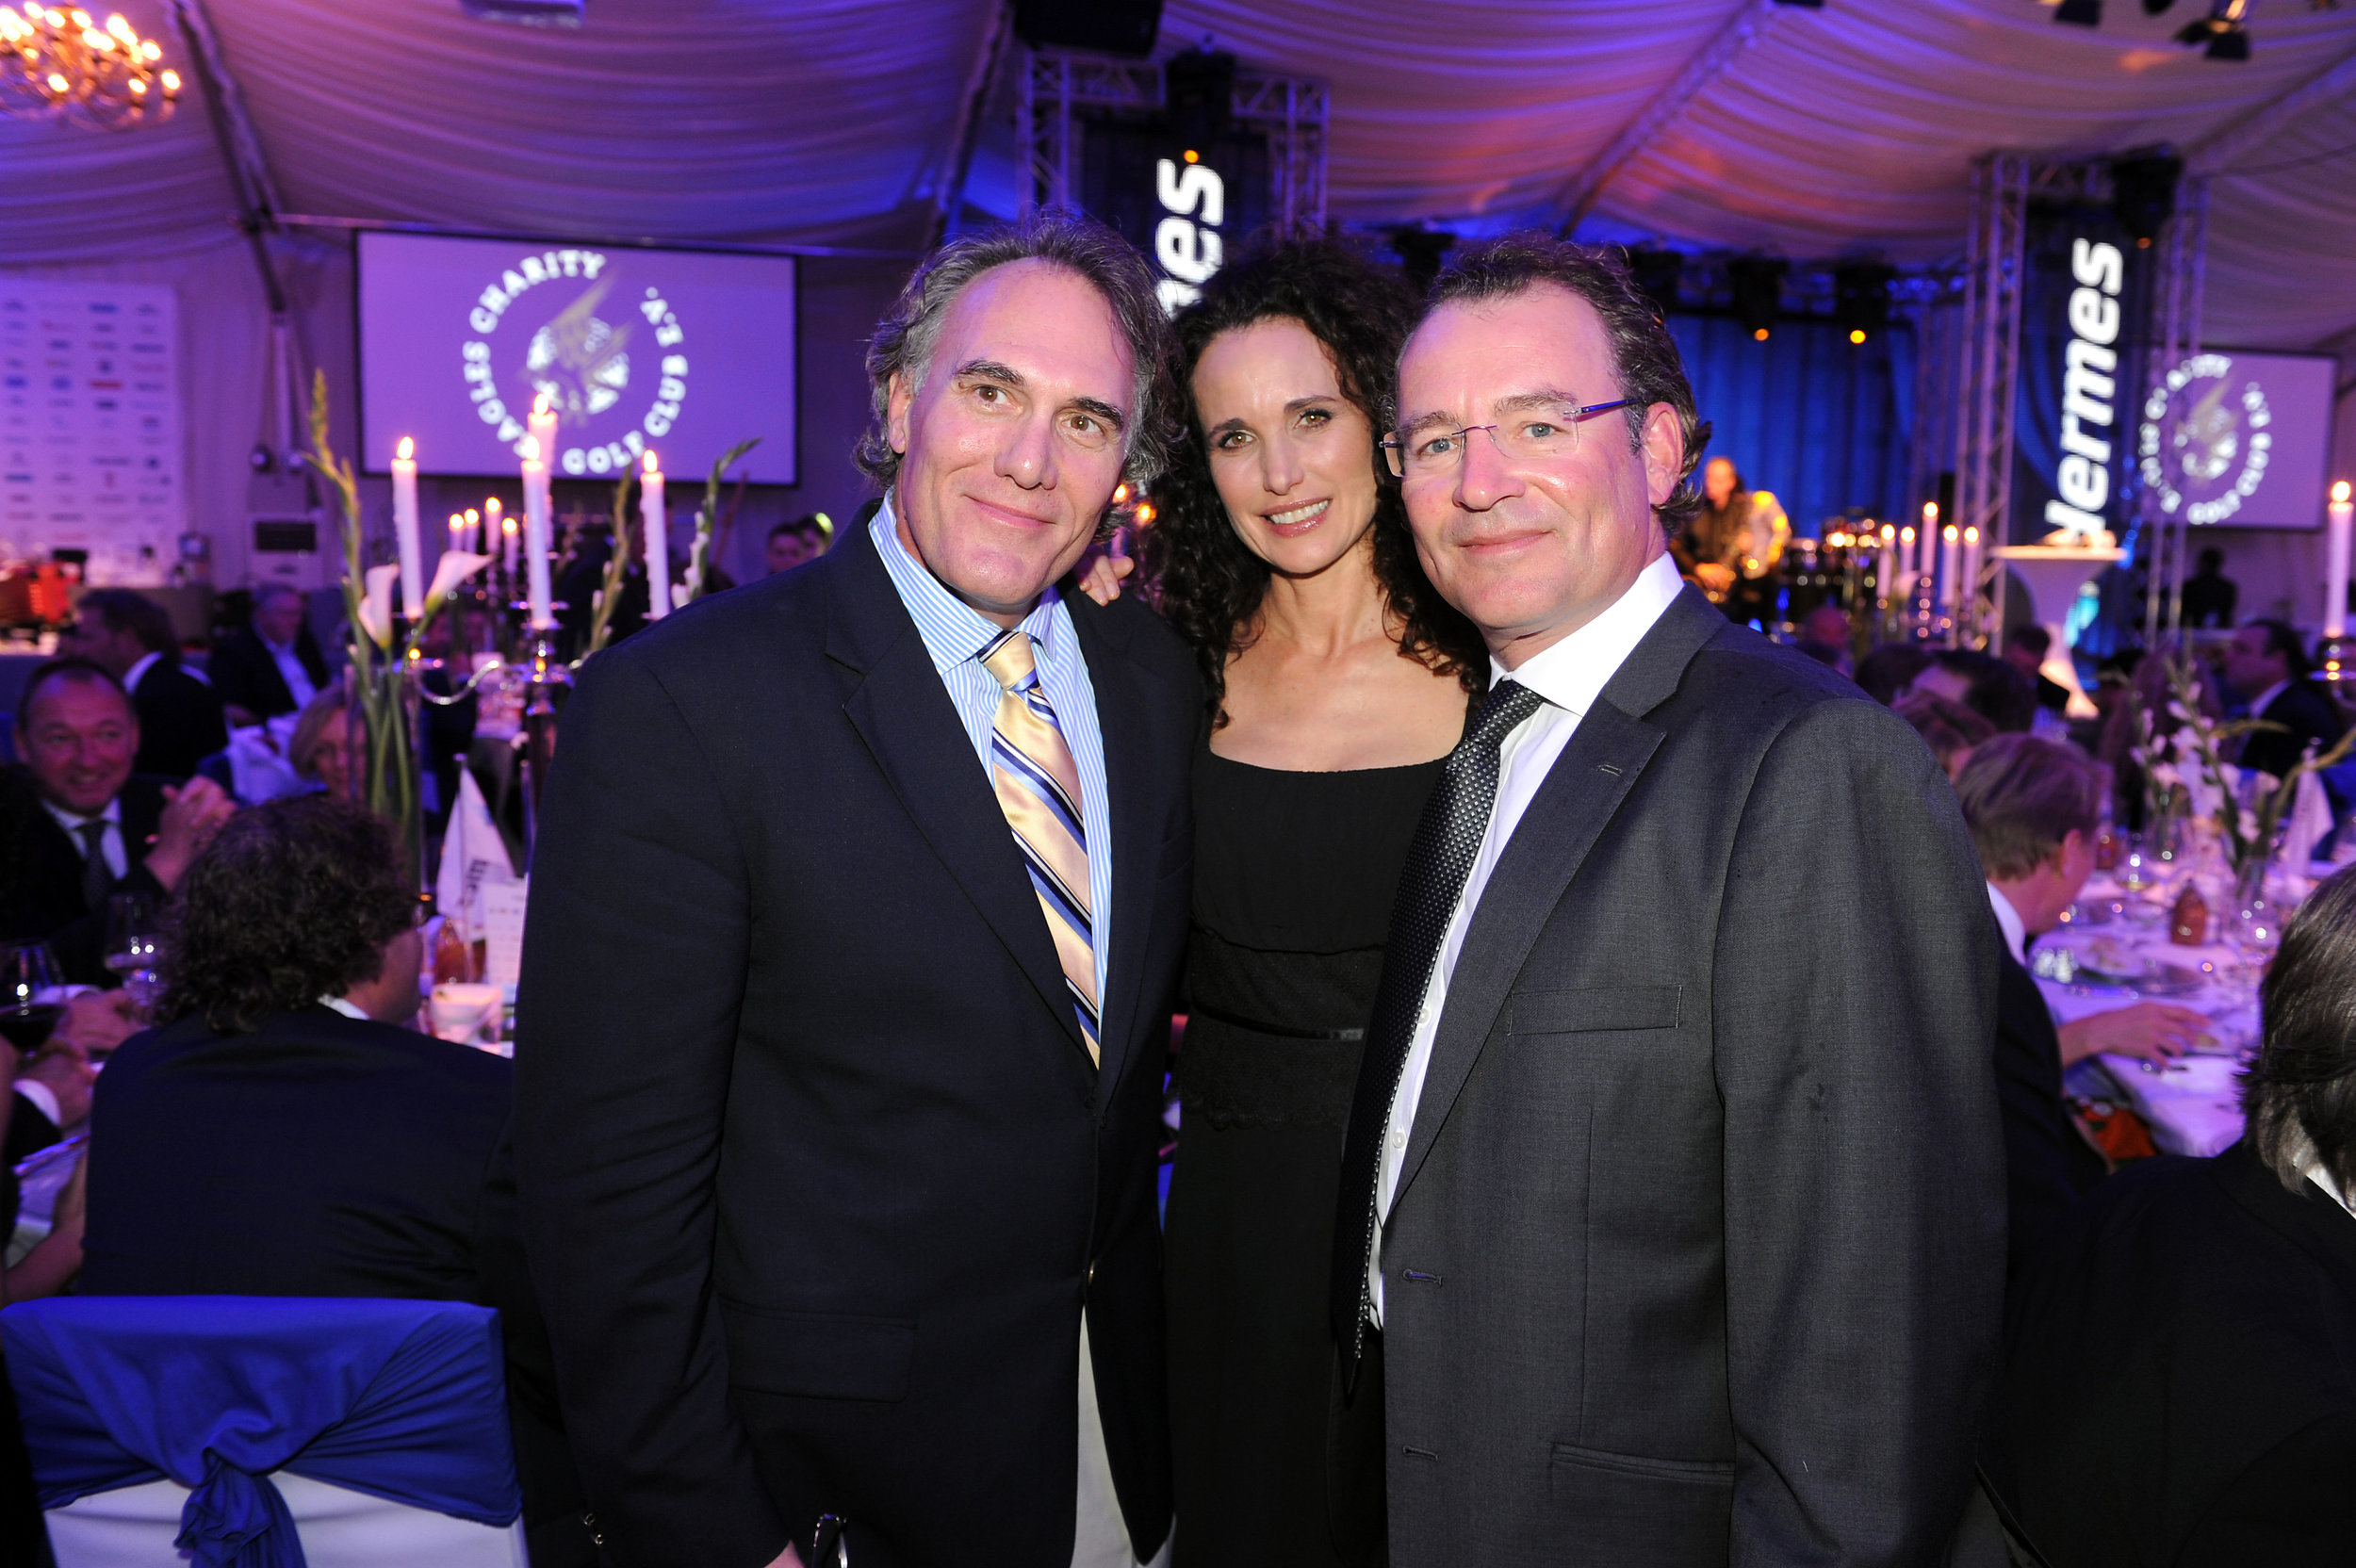 Preston Sullivan, Andie MacDowell and Markus Klamert.JPG